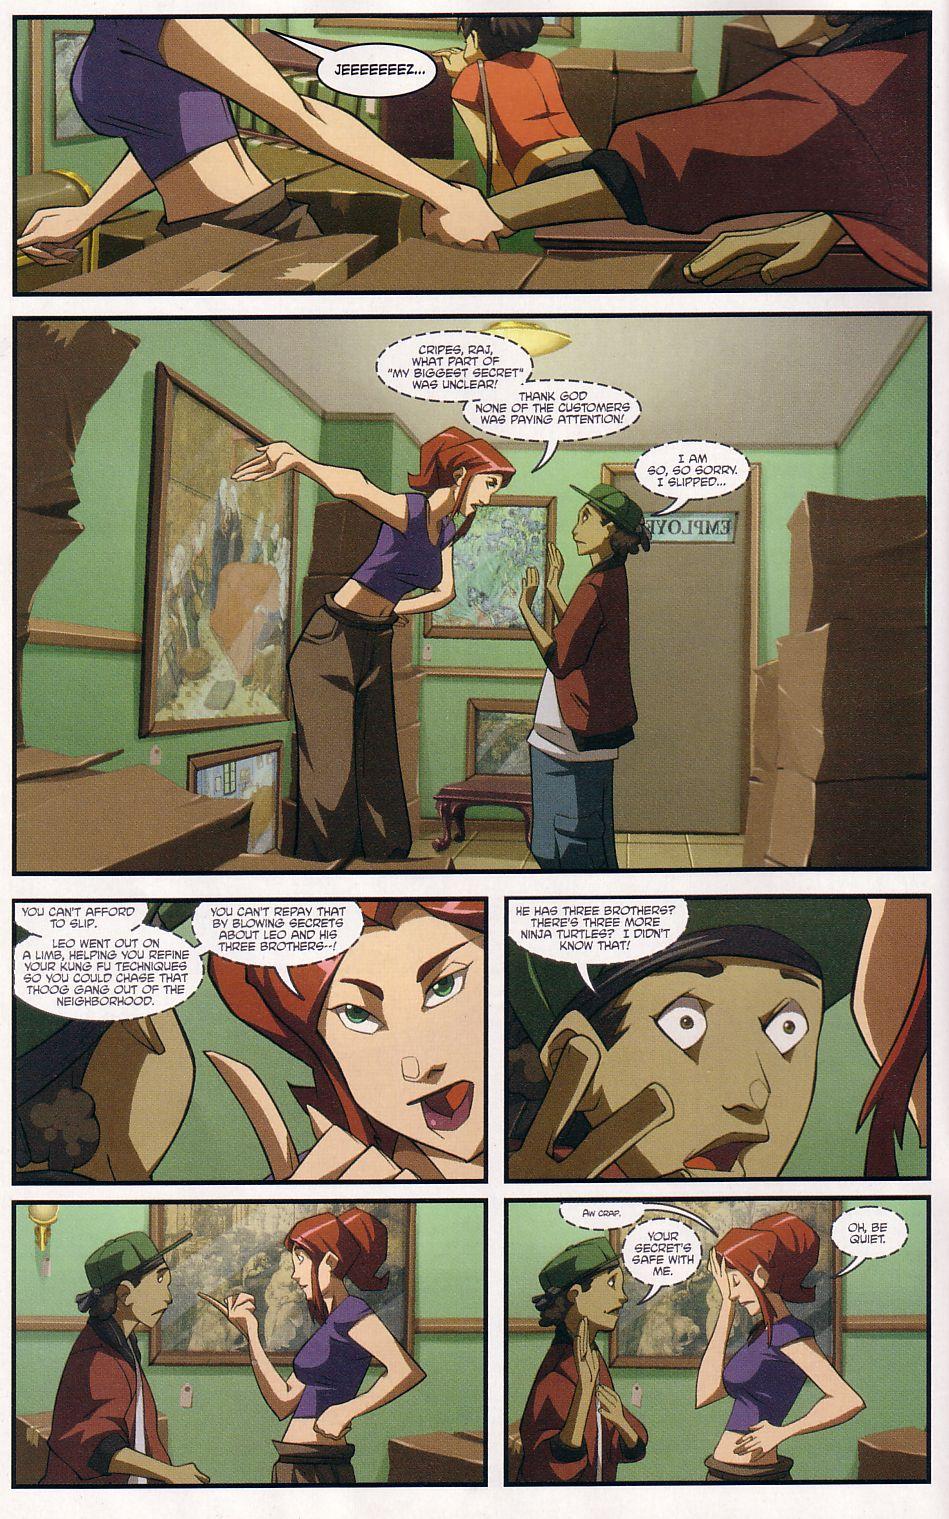 Teenage Mutant Ninja Turtles (2003) chap 7 pic 4